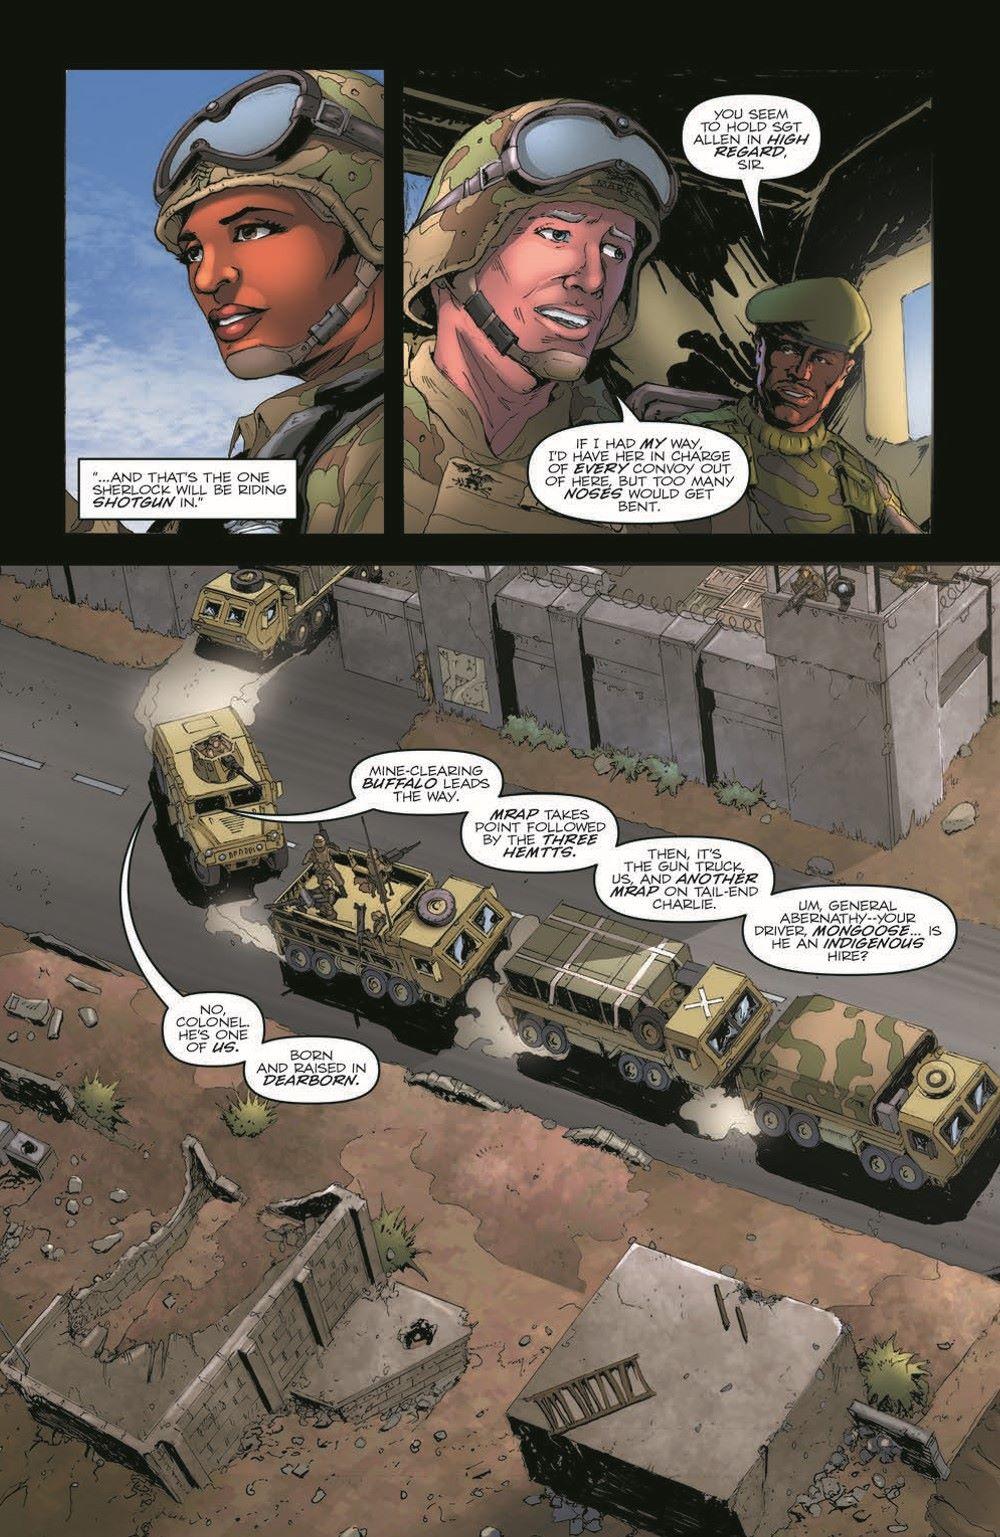 GIJoeRAH281-pr-4 ComicList Previews: G.I. JOE A REAL AMERICAN HERO #281